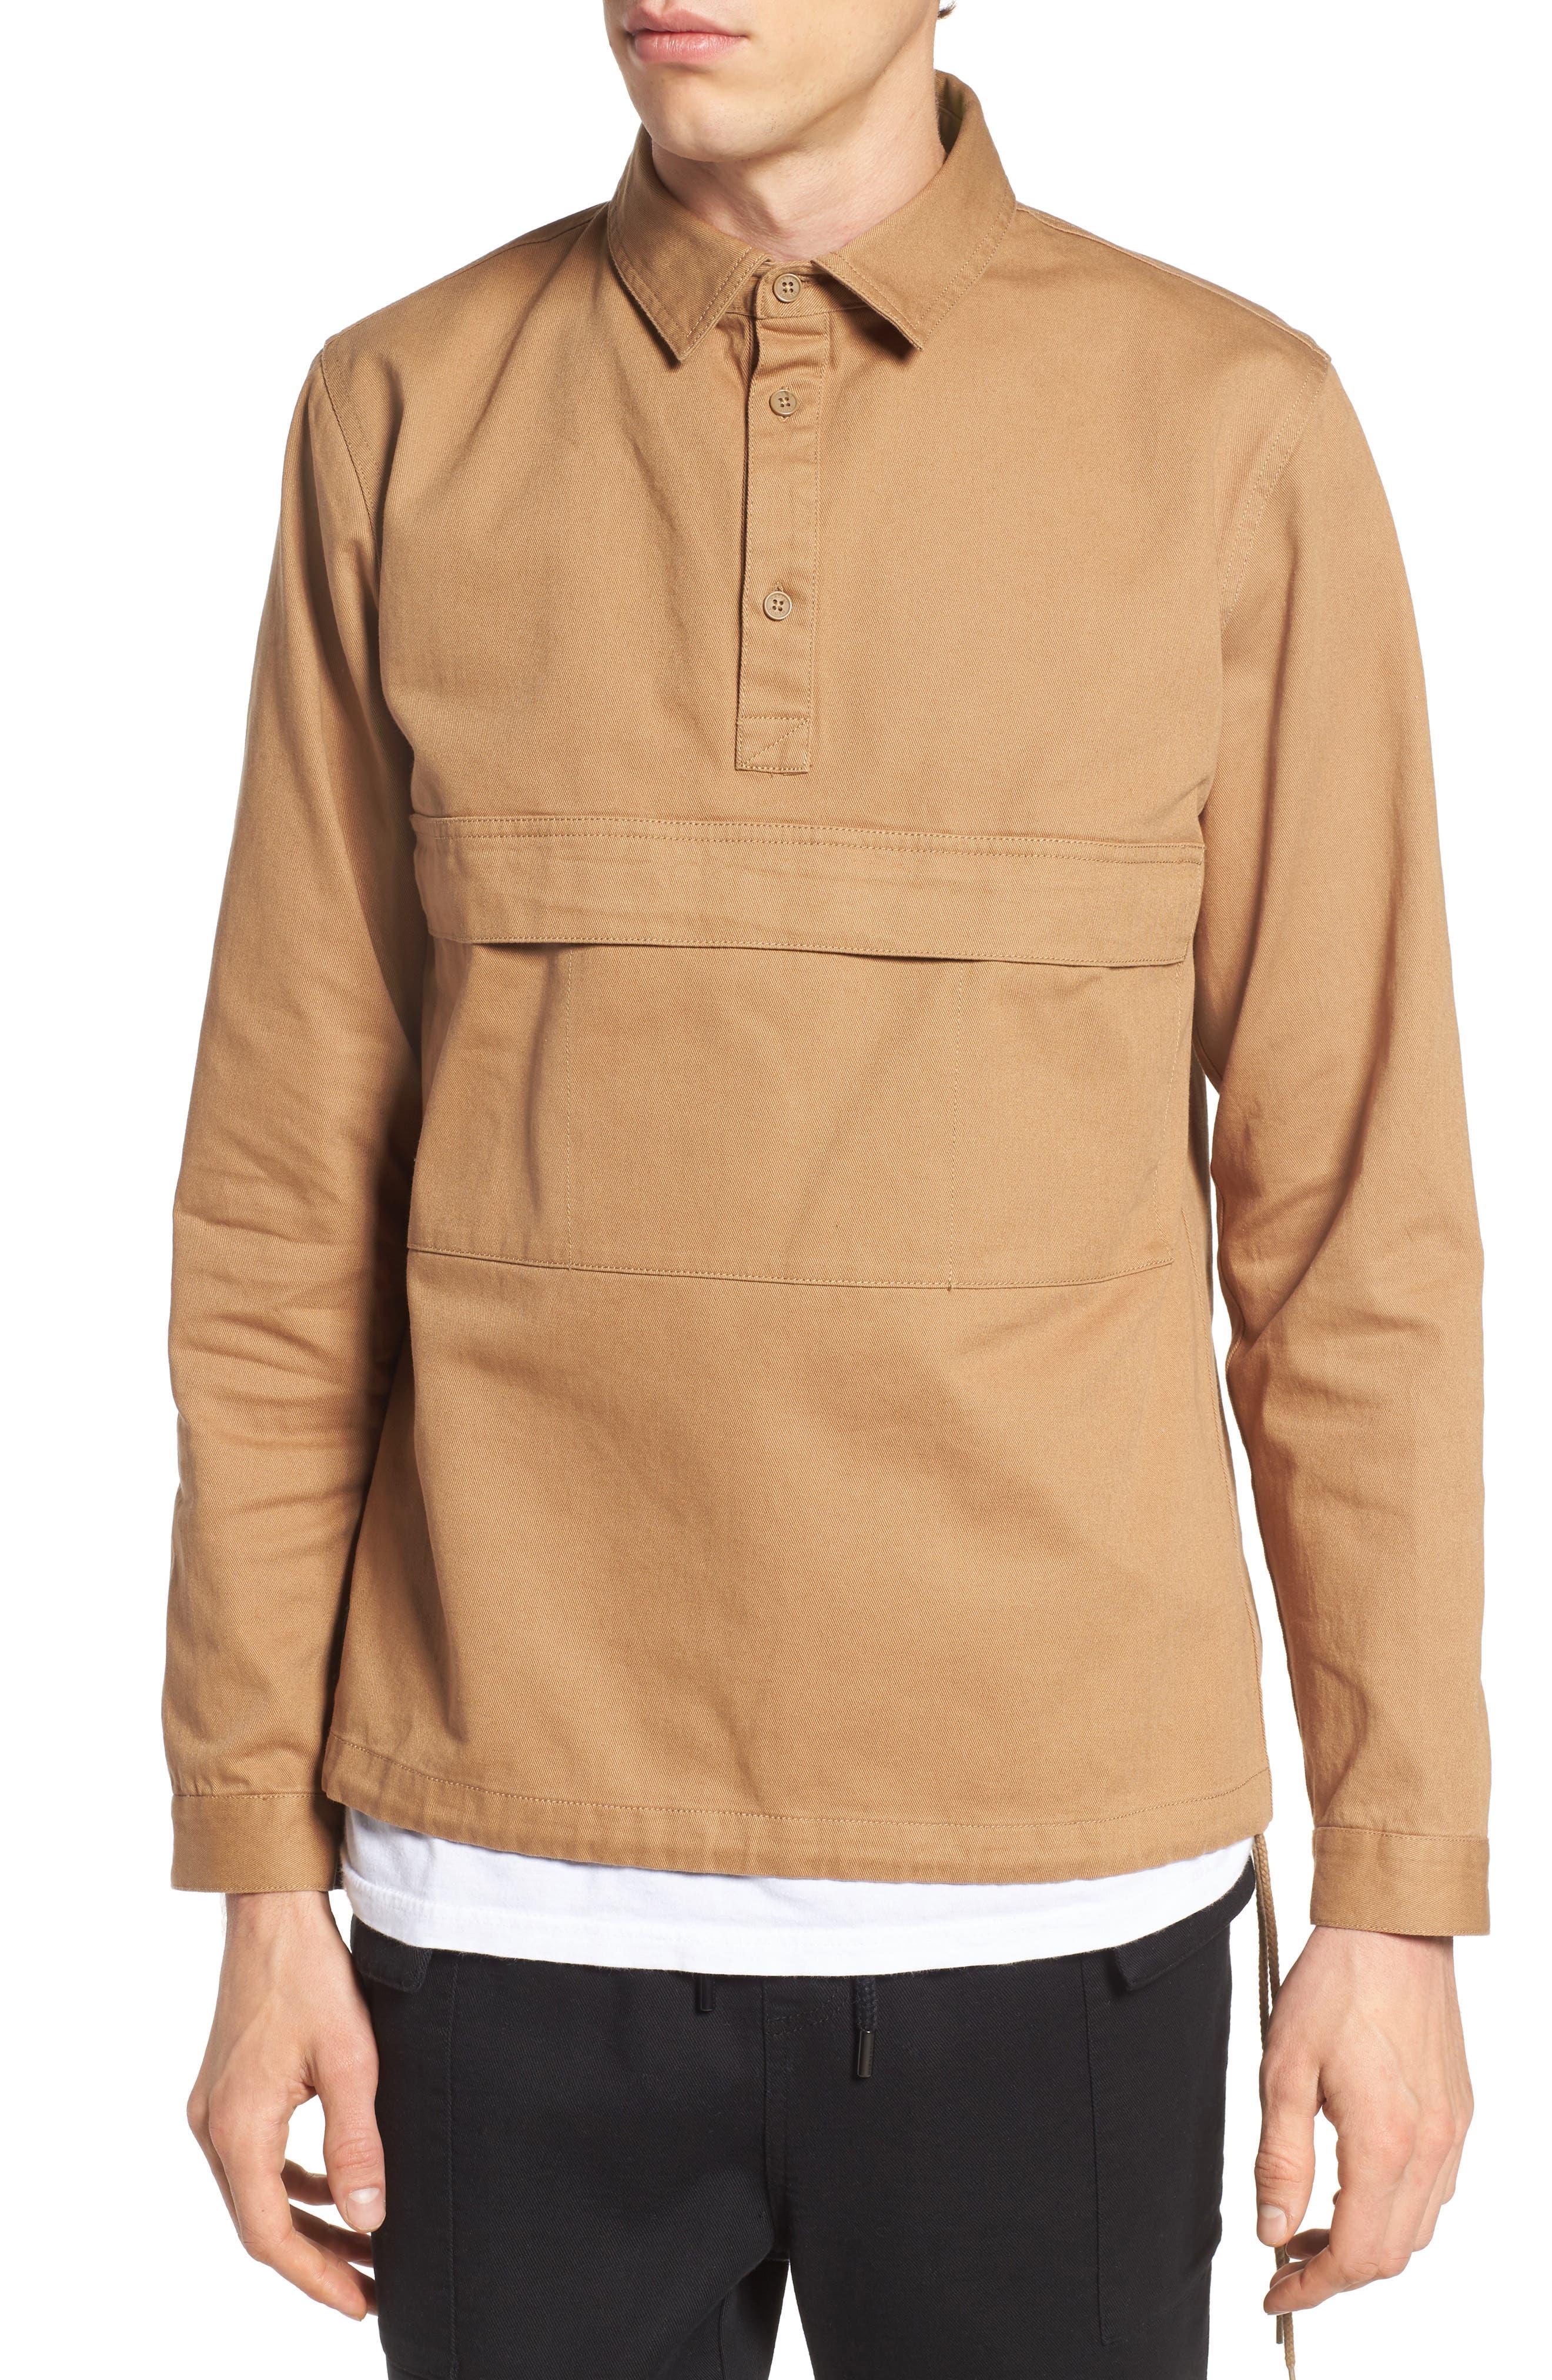 Woodside Twill Shirt,                         Main,                         color, Sand